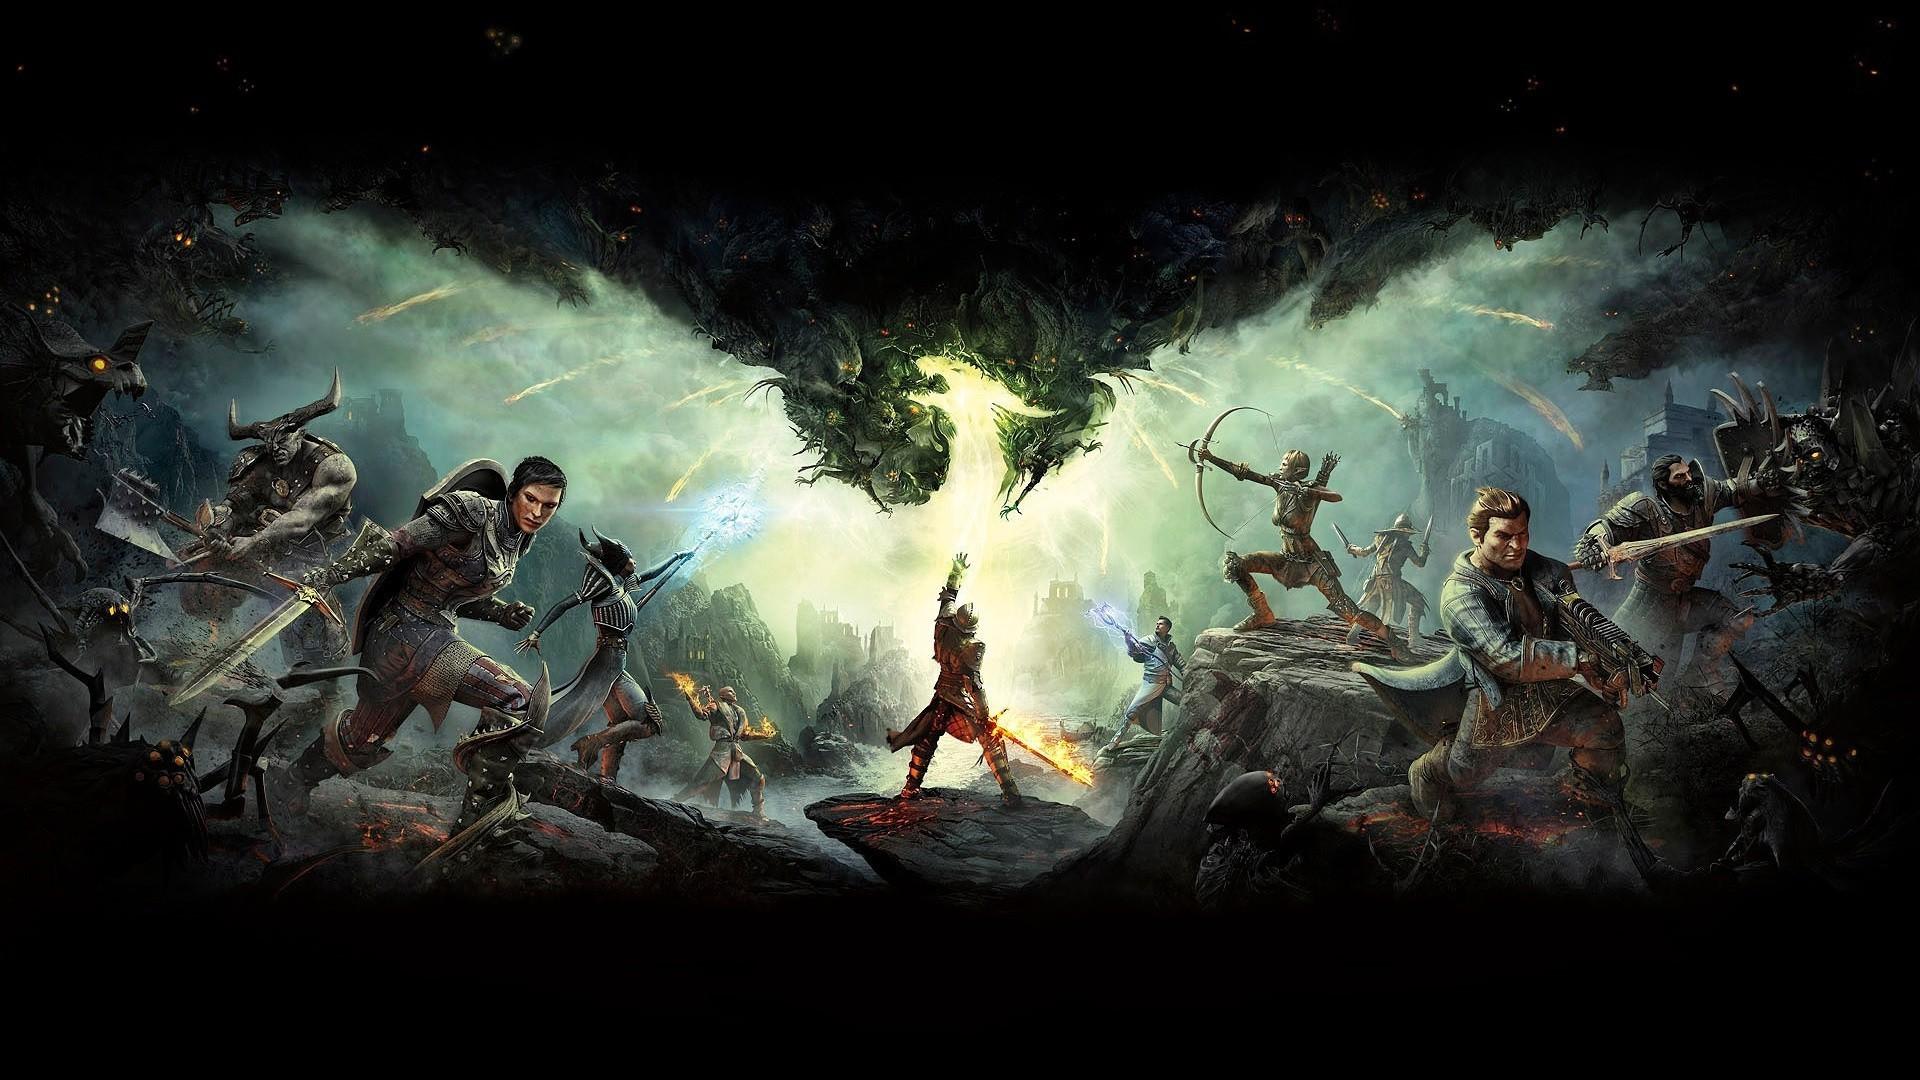 1920x1080 Px Dragon Age Inquisition